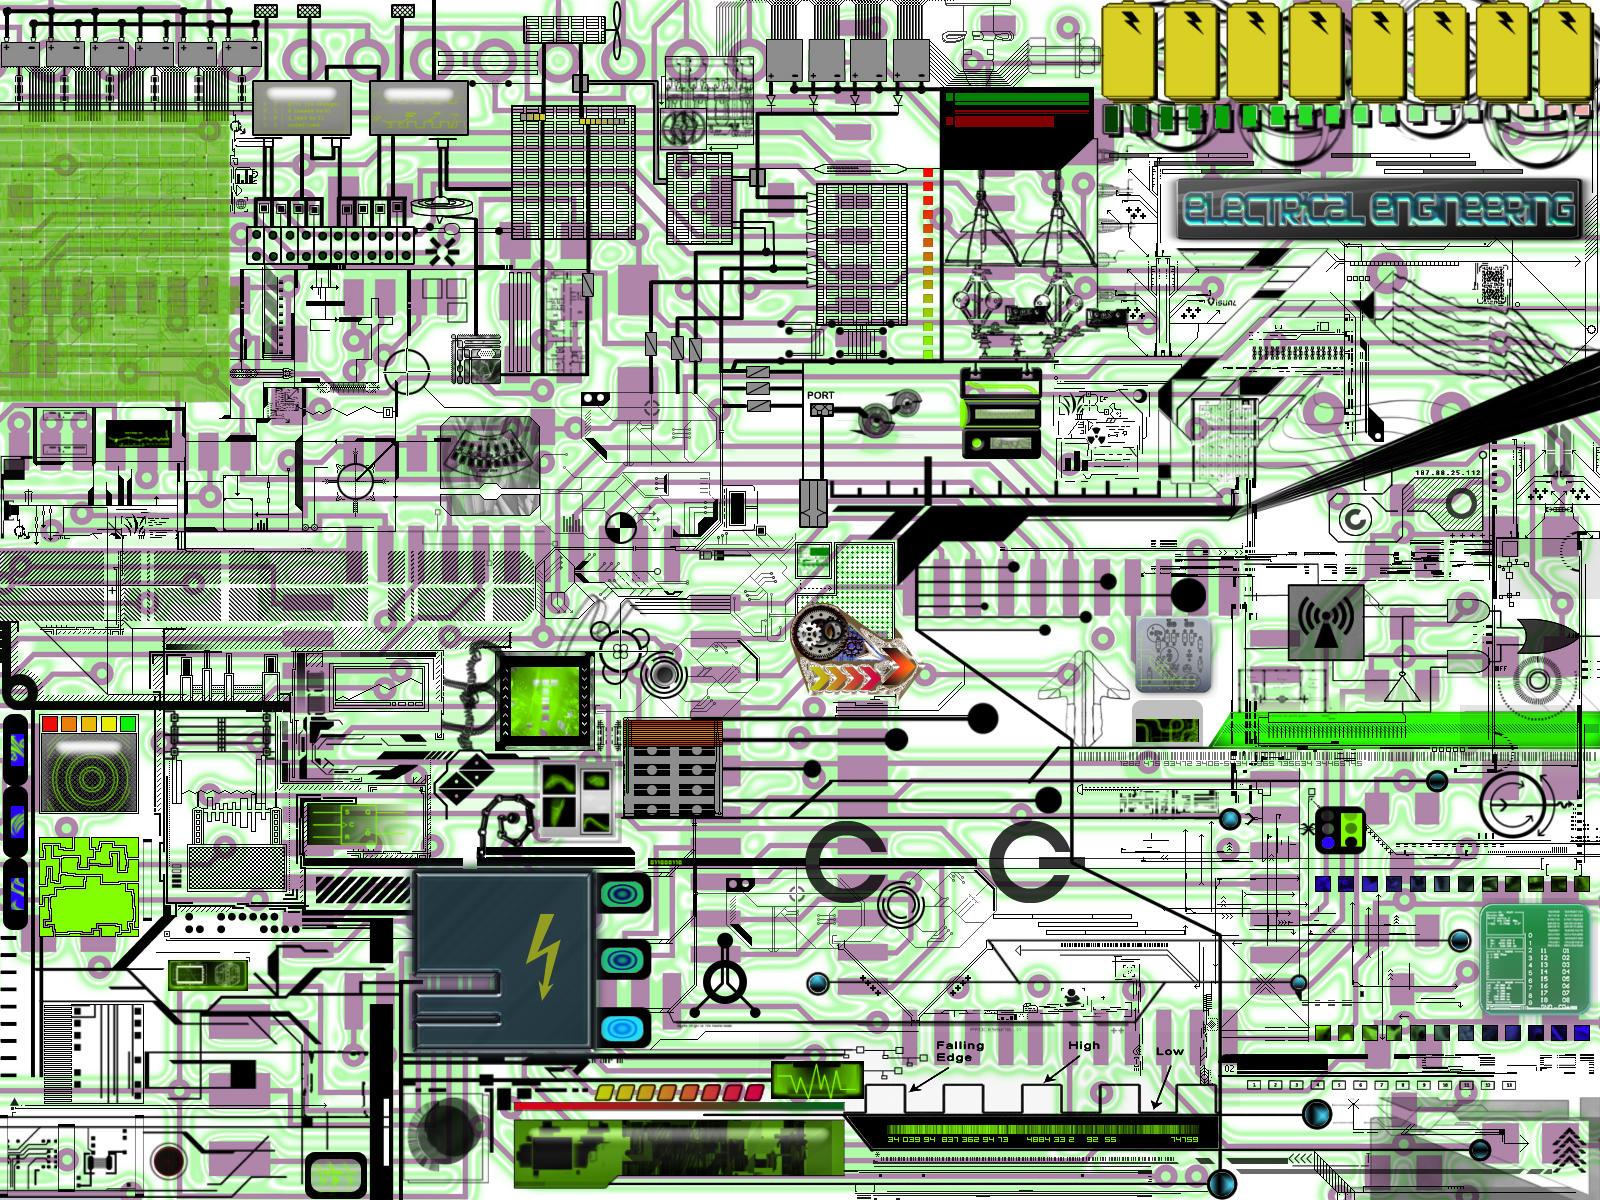 M Hammer44 13 4 Electrical Engineering By Goazilla